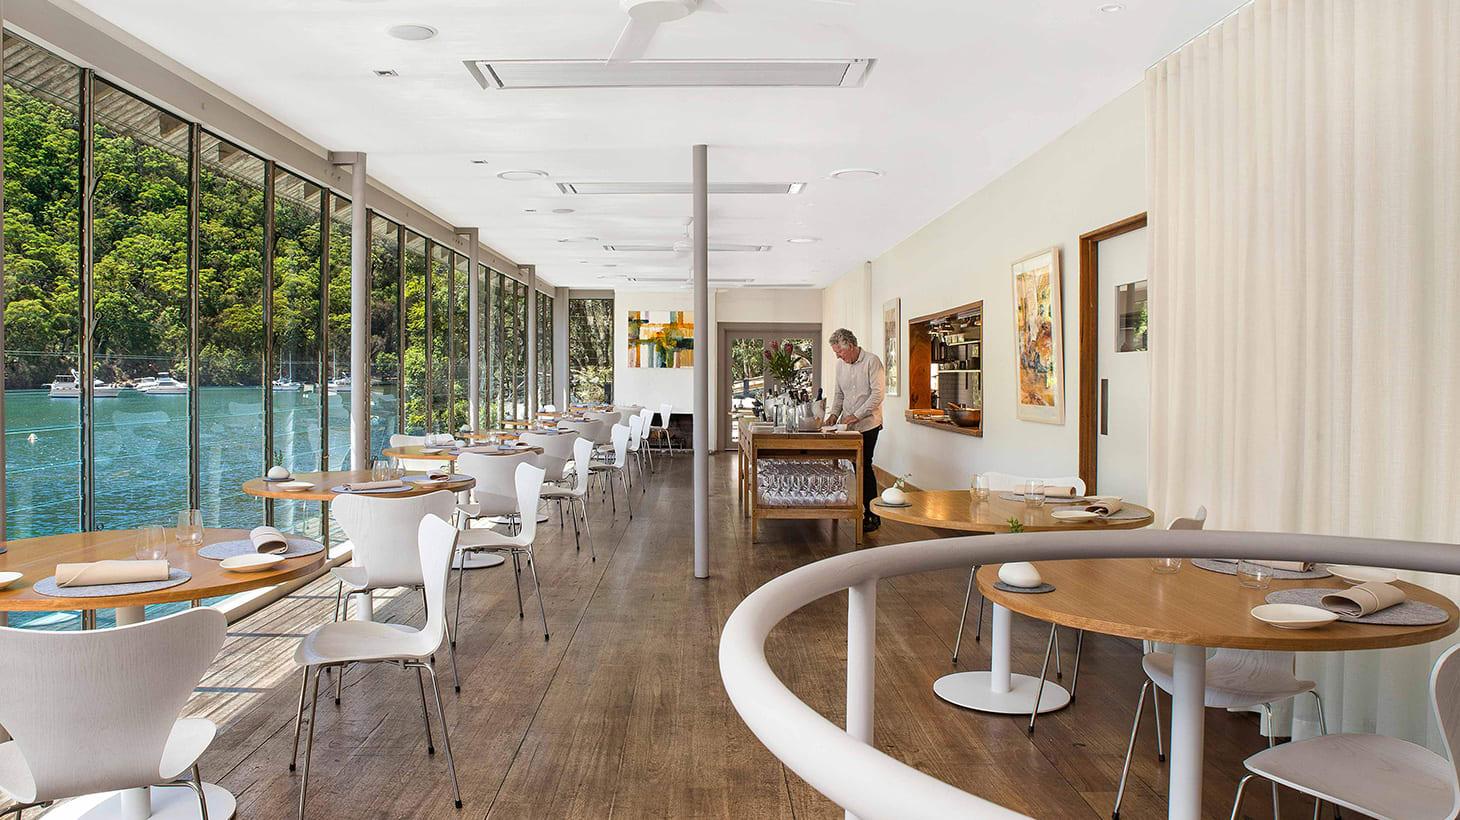 Five-Dish Waterside Lunch or Dinner at the Iconic Chef-Hatted Berowra Waters Inn Berowra Waters Inn Berowra